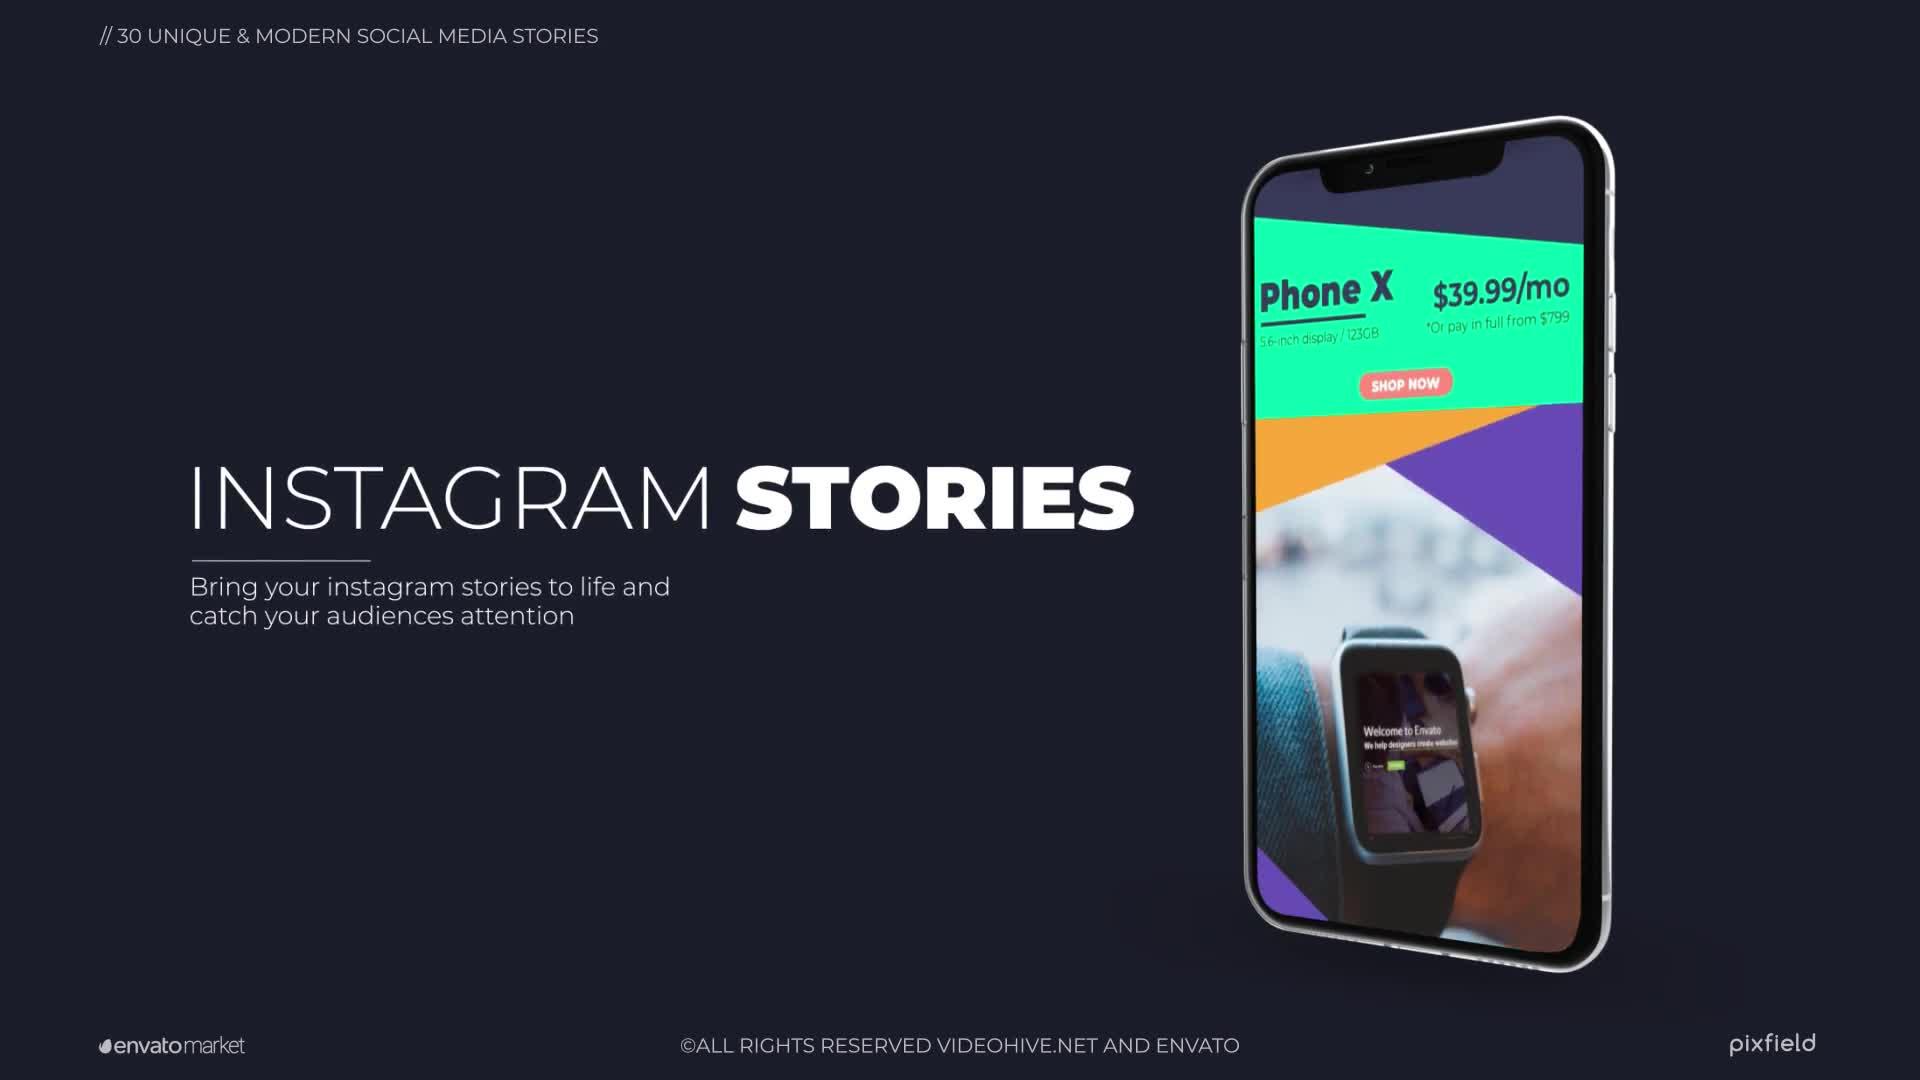 DOWNLOAD INSTAGRAM STORY VIDEO IPHONE - Instagram Stories